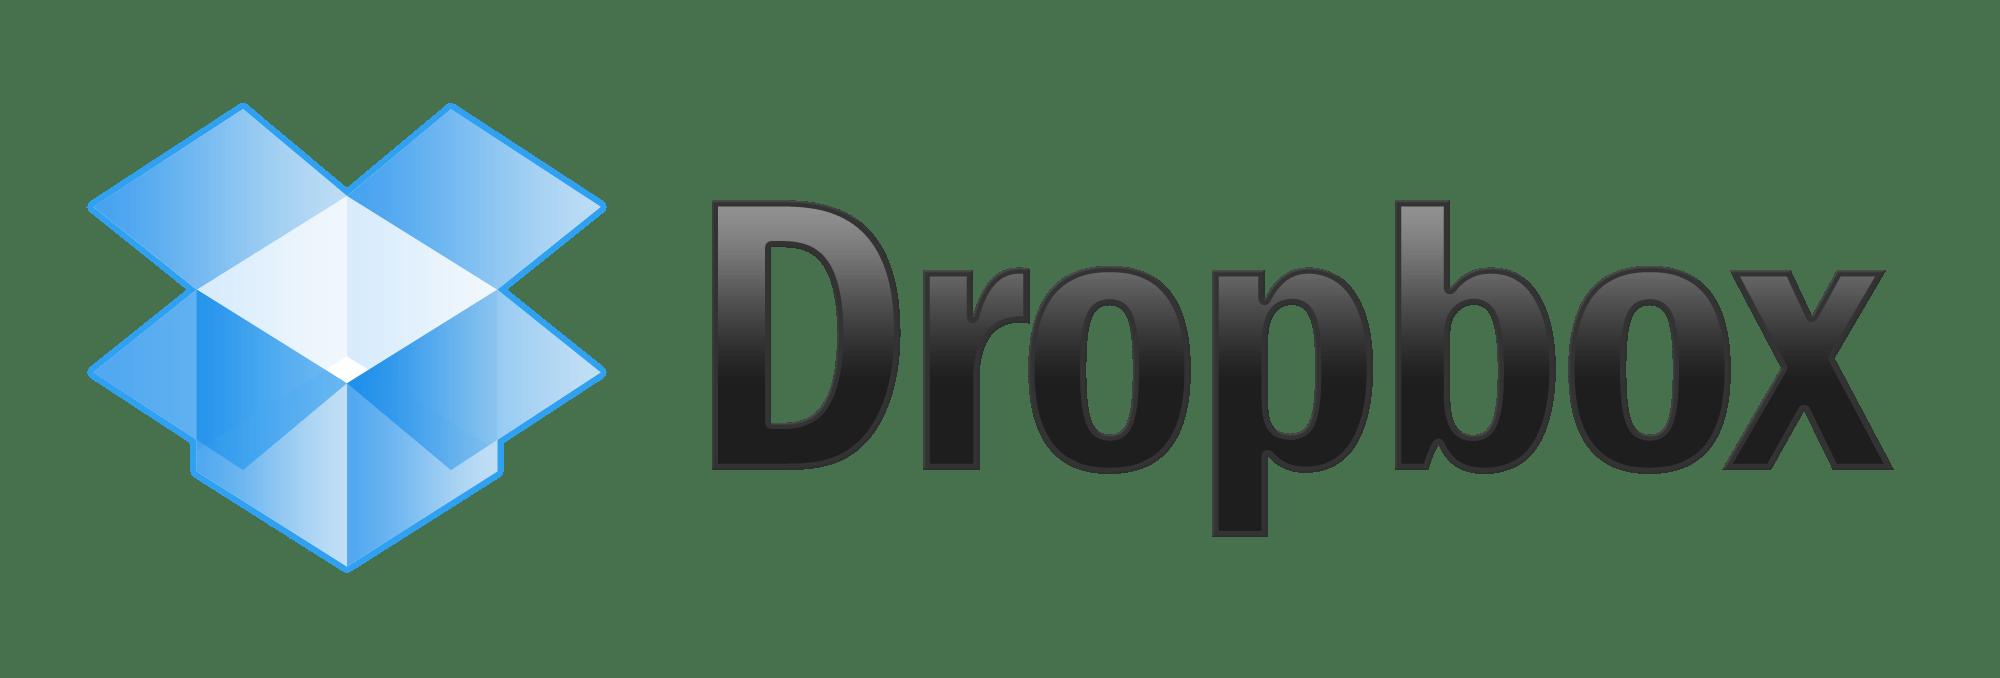 dropbox free download